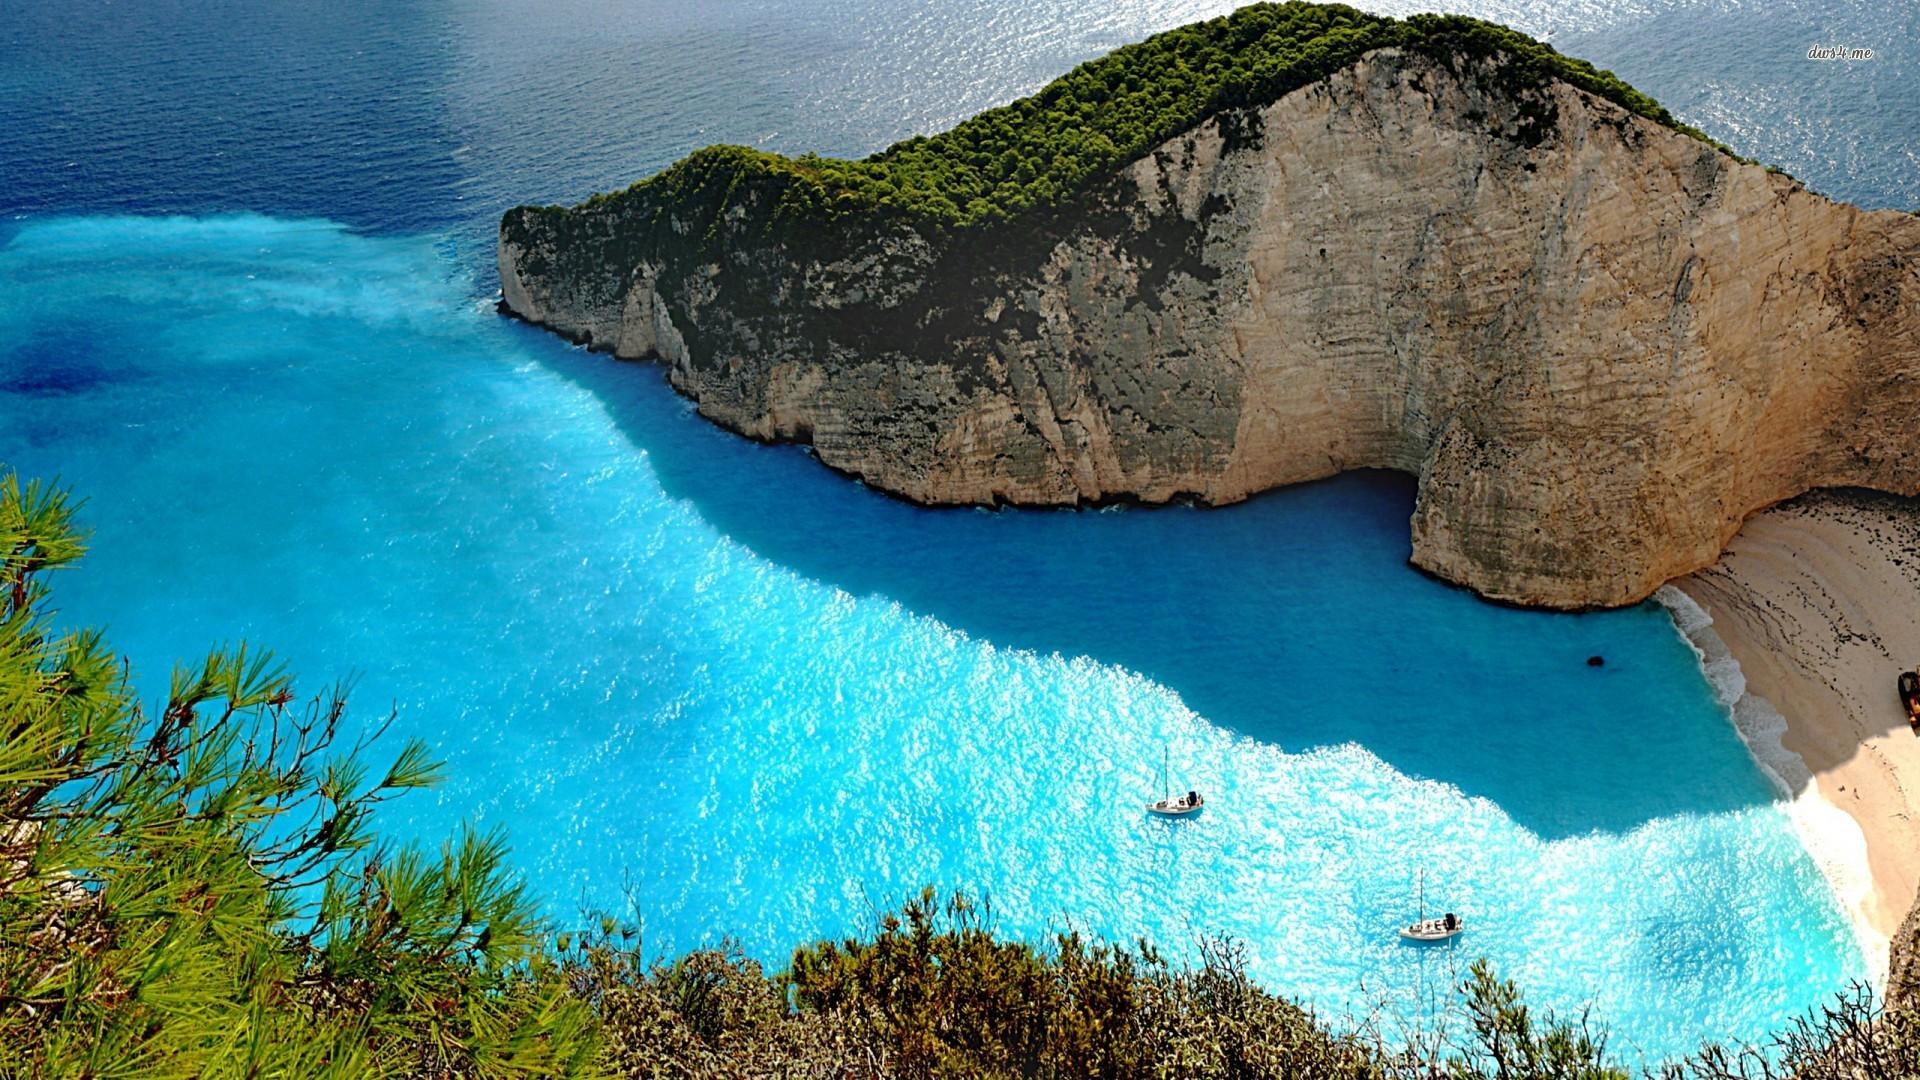 41 Greece Beach Wallpaper On Wallpapersafari